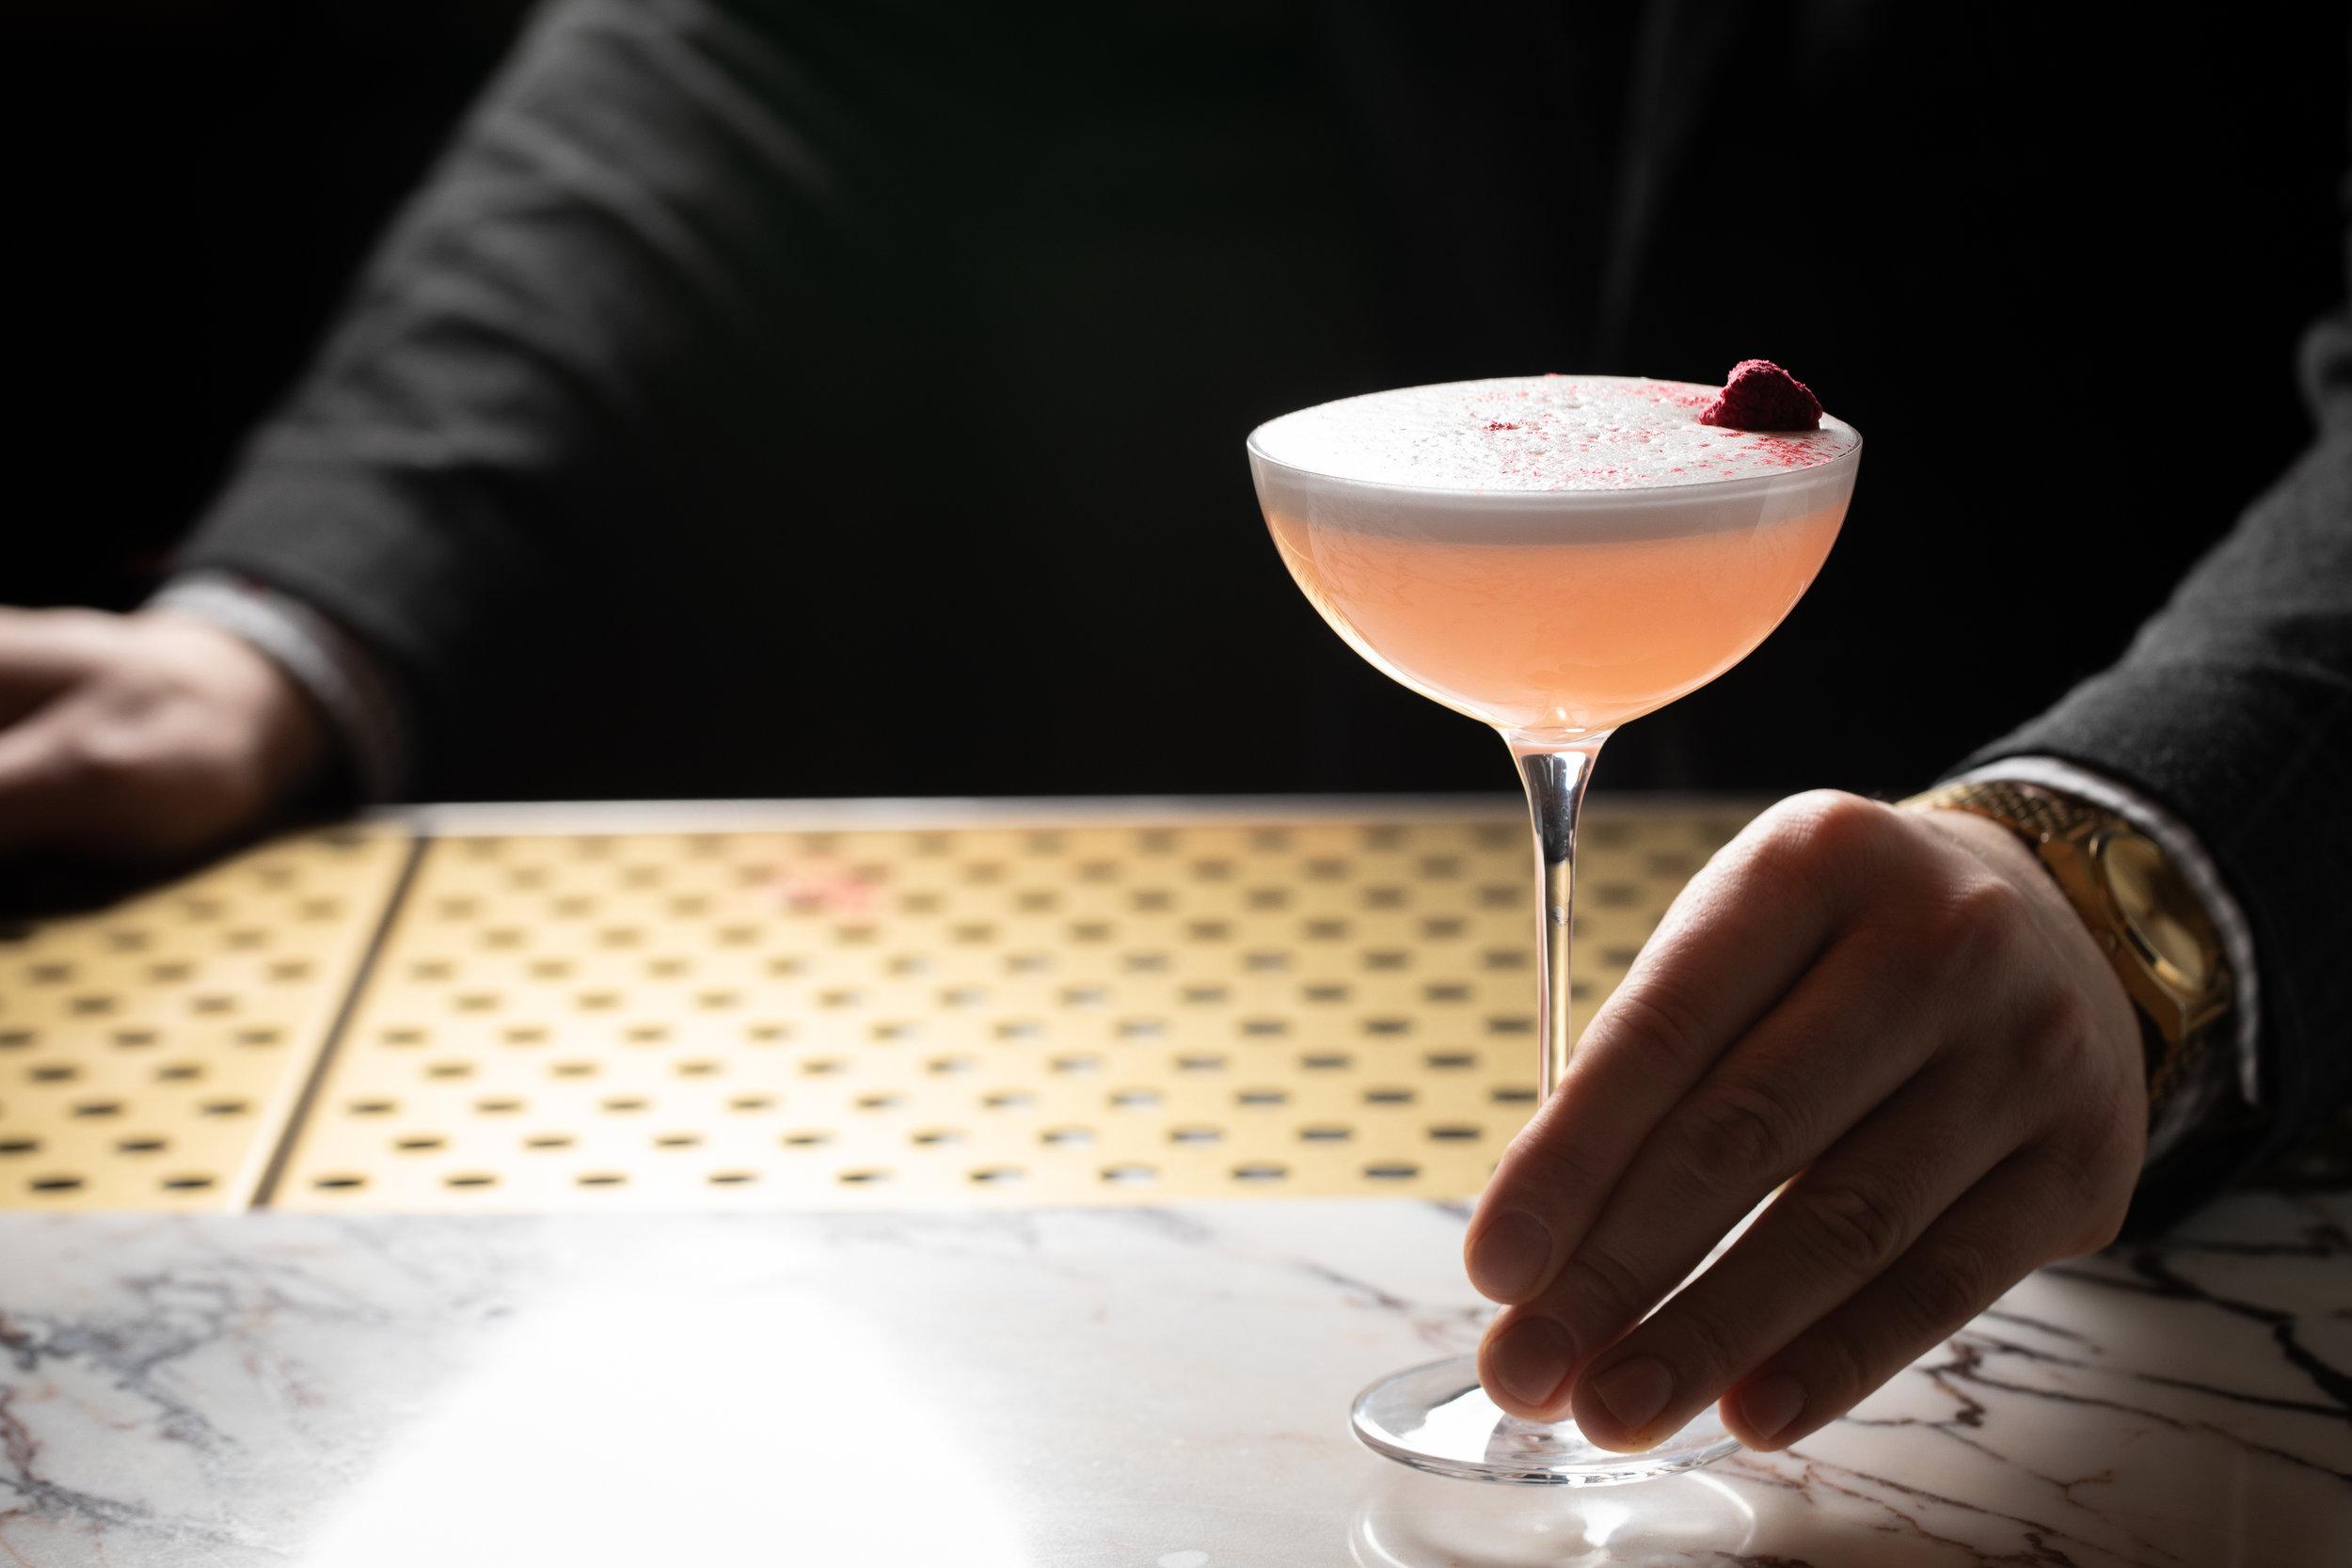 Lazy Bird cocktails-clover club-GALDOPHOTO Hoxton_26Mar2019_HG0005.jpg